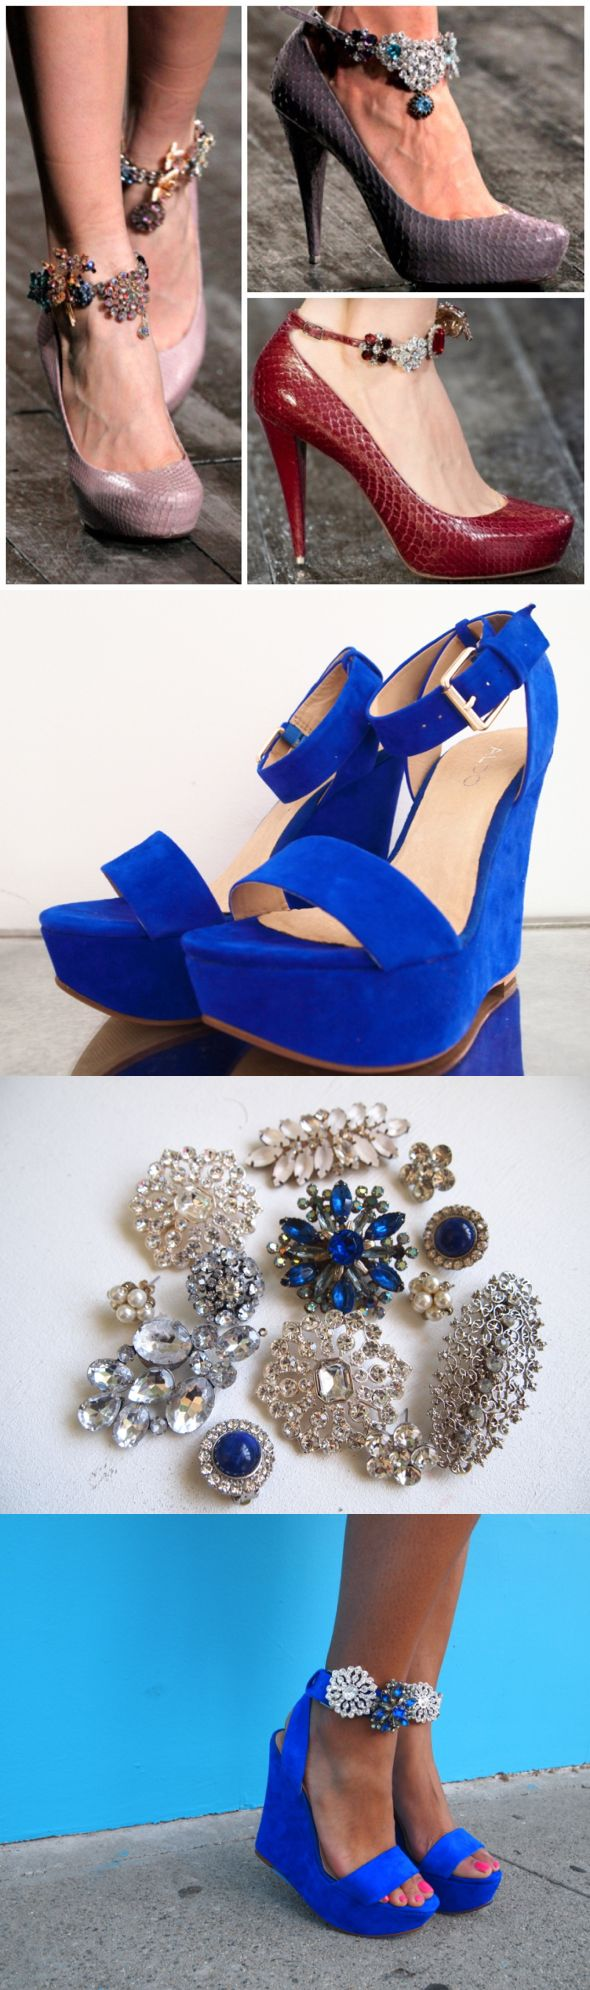 12 Fashionable DIY Ideas - Fashion Diva Design